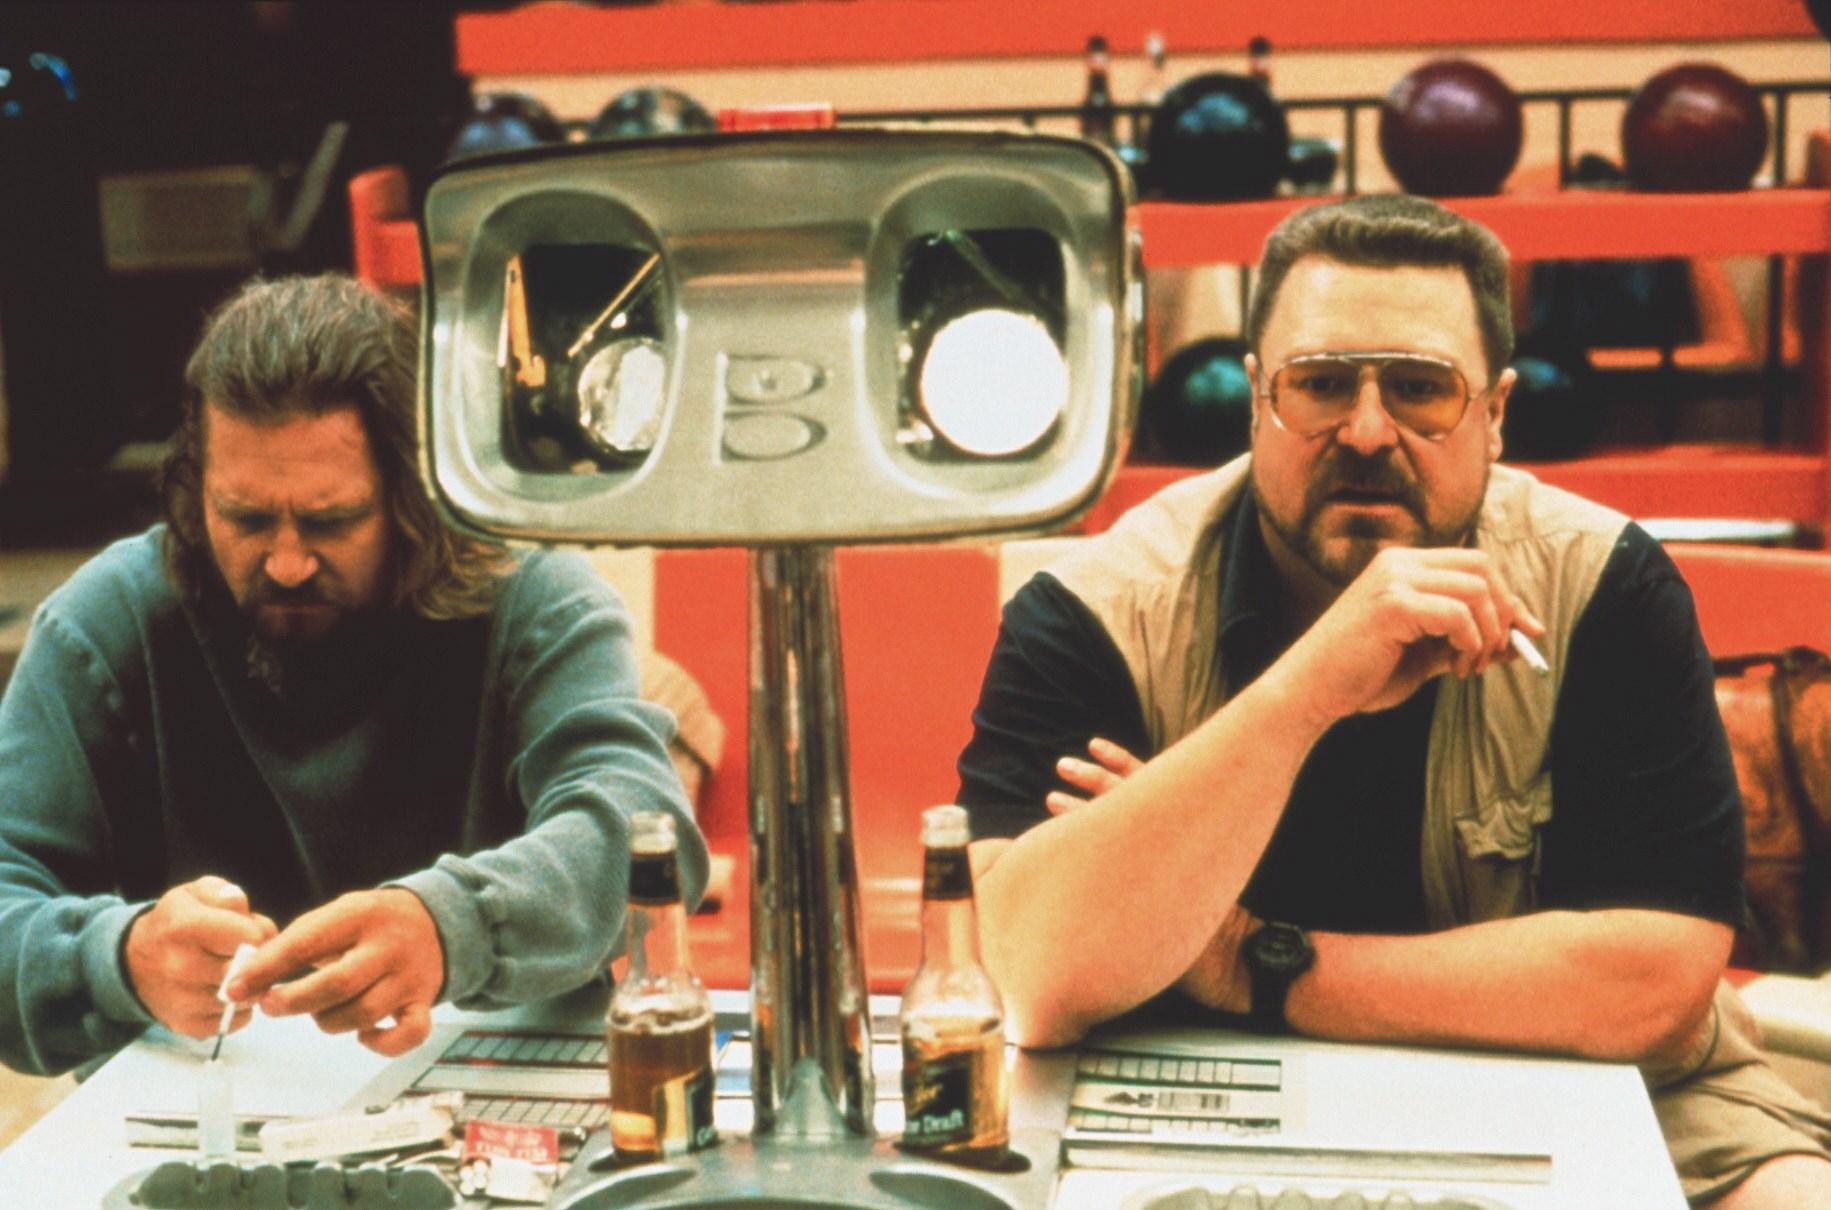 The Big Lebowski (The Big Lebowski, USA 1998, Regie: Joel und Ethan Coen) Jeff Bridges, John Goodman / zwei Männer, Freunde,